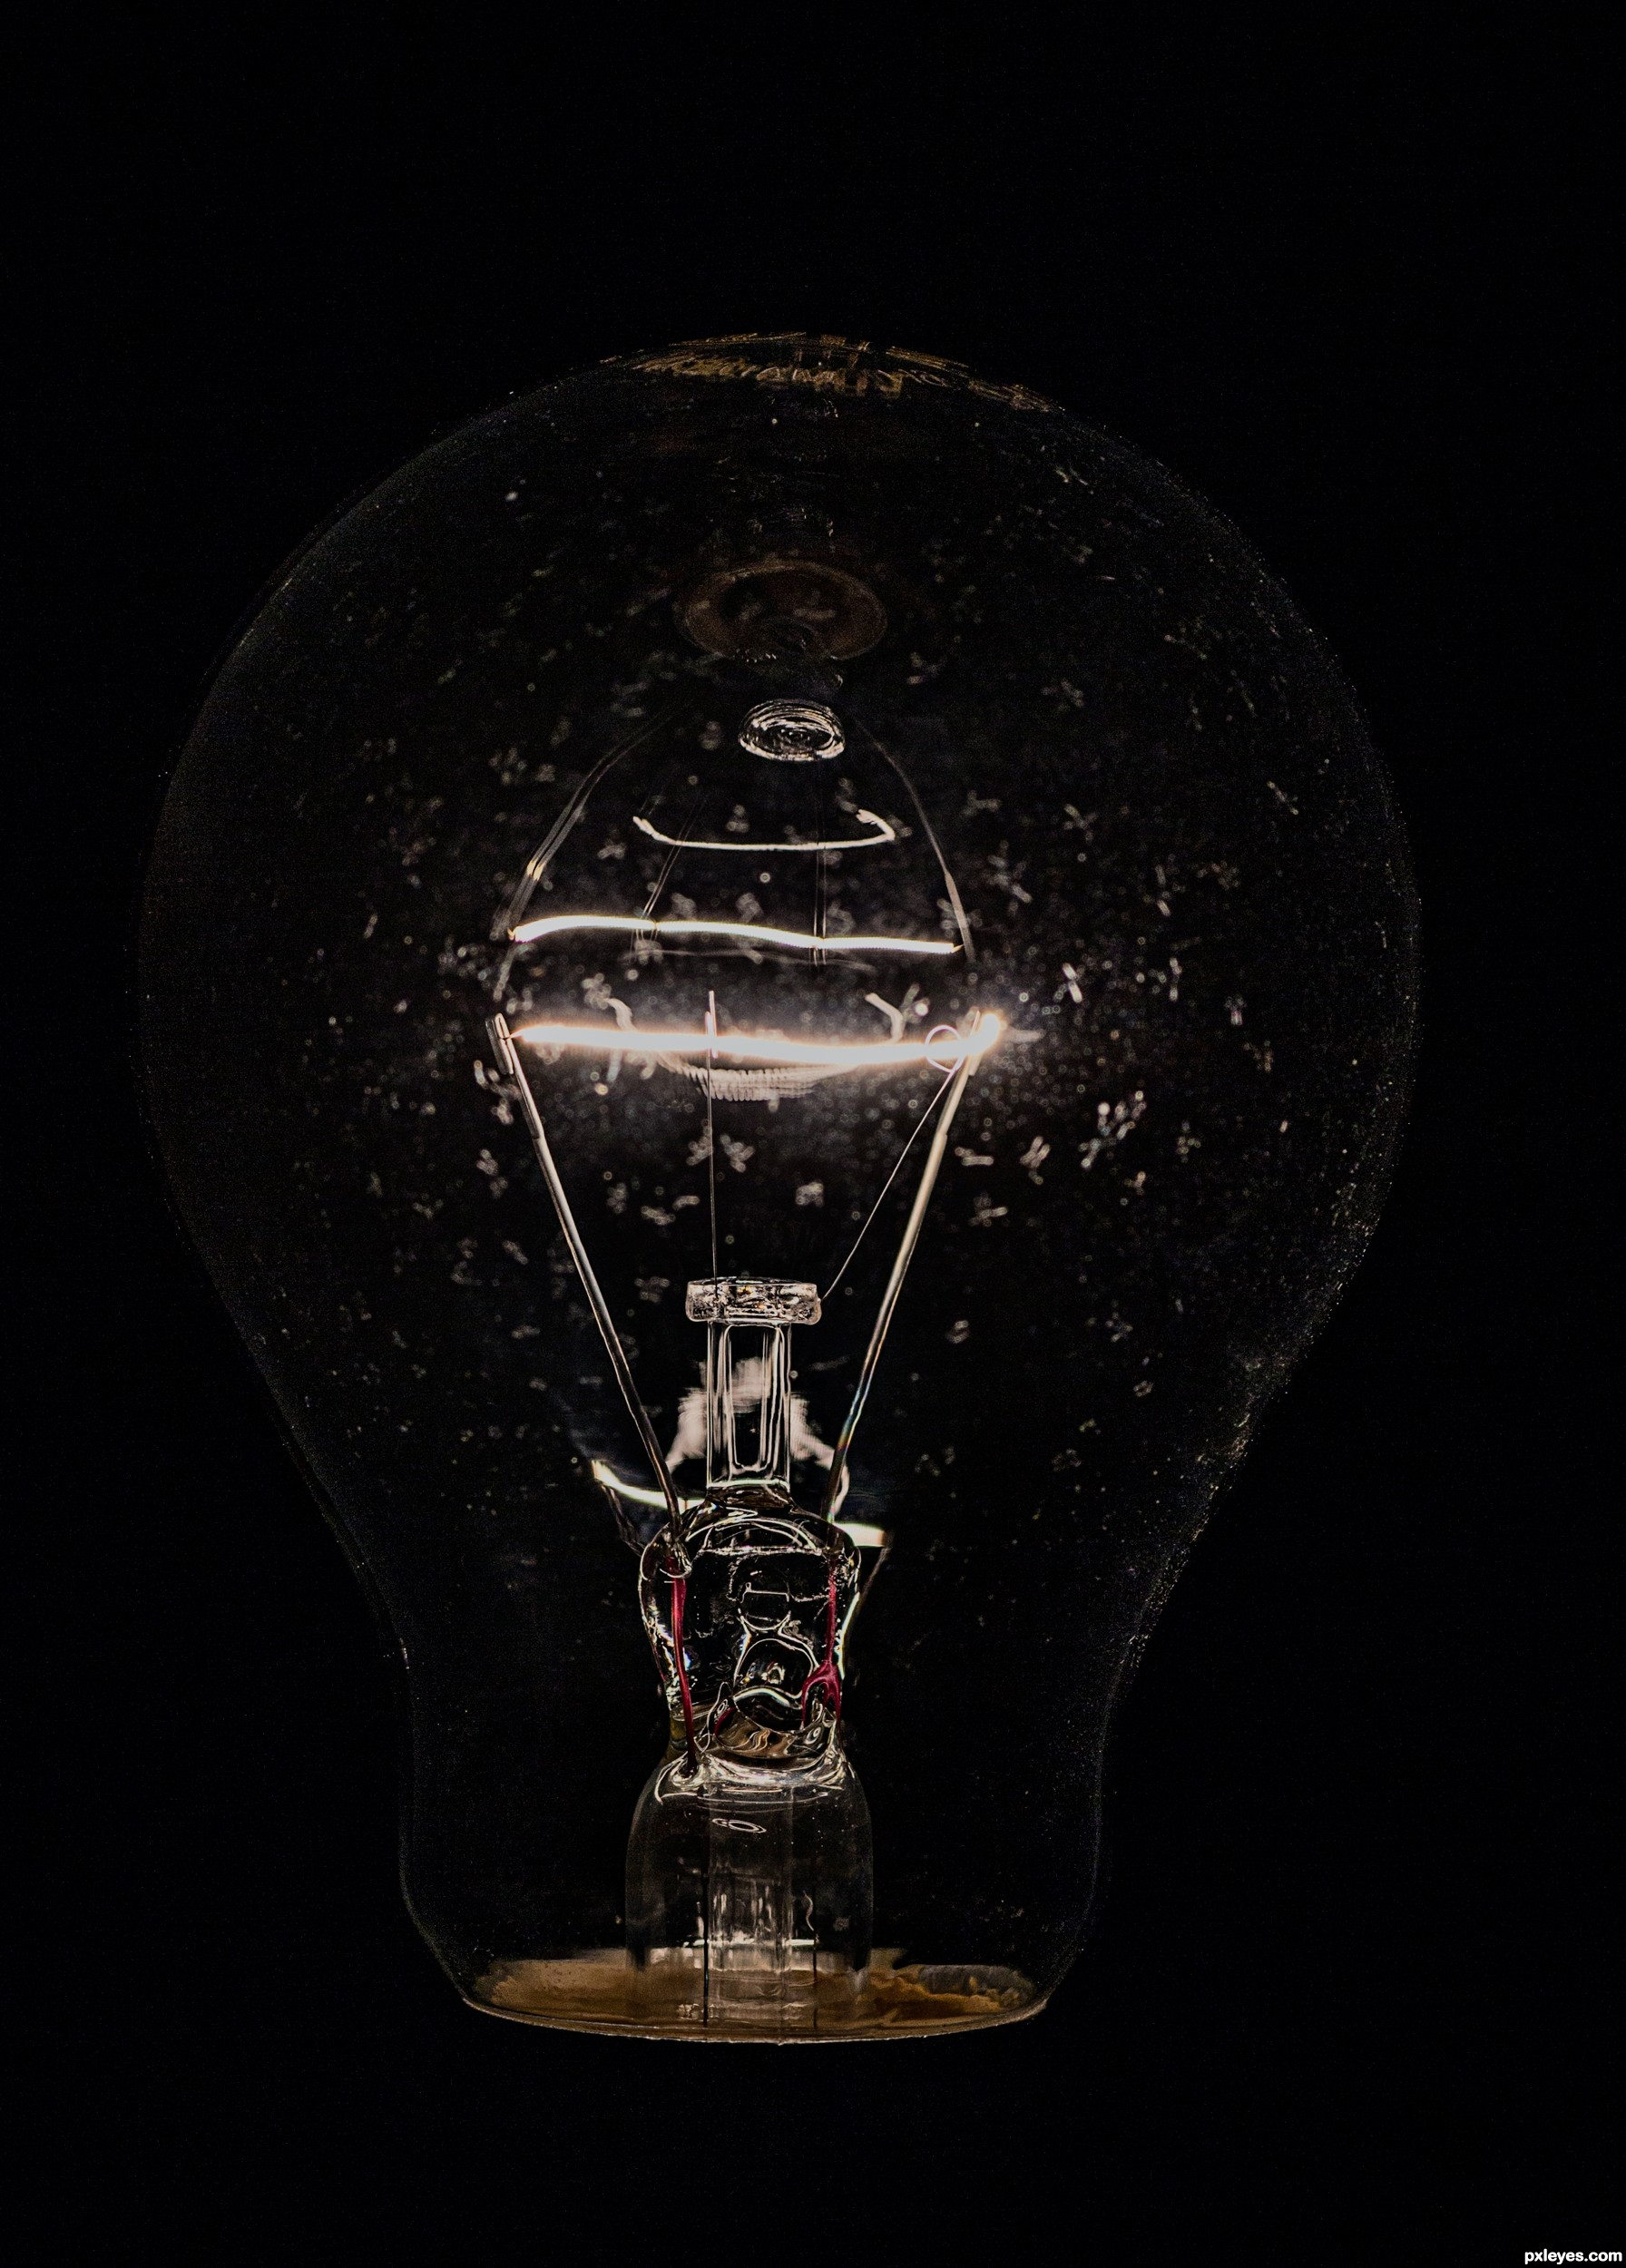 Dark room with light bulb - Dark Room With Light Bulb